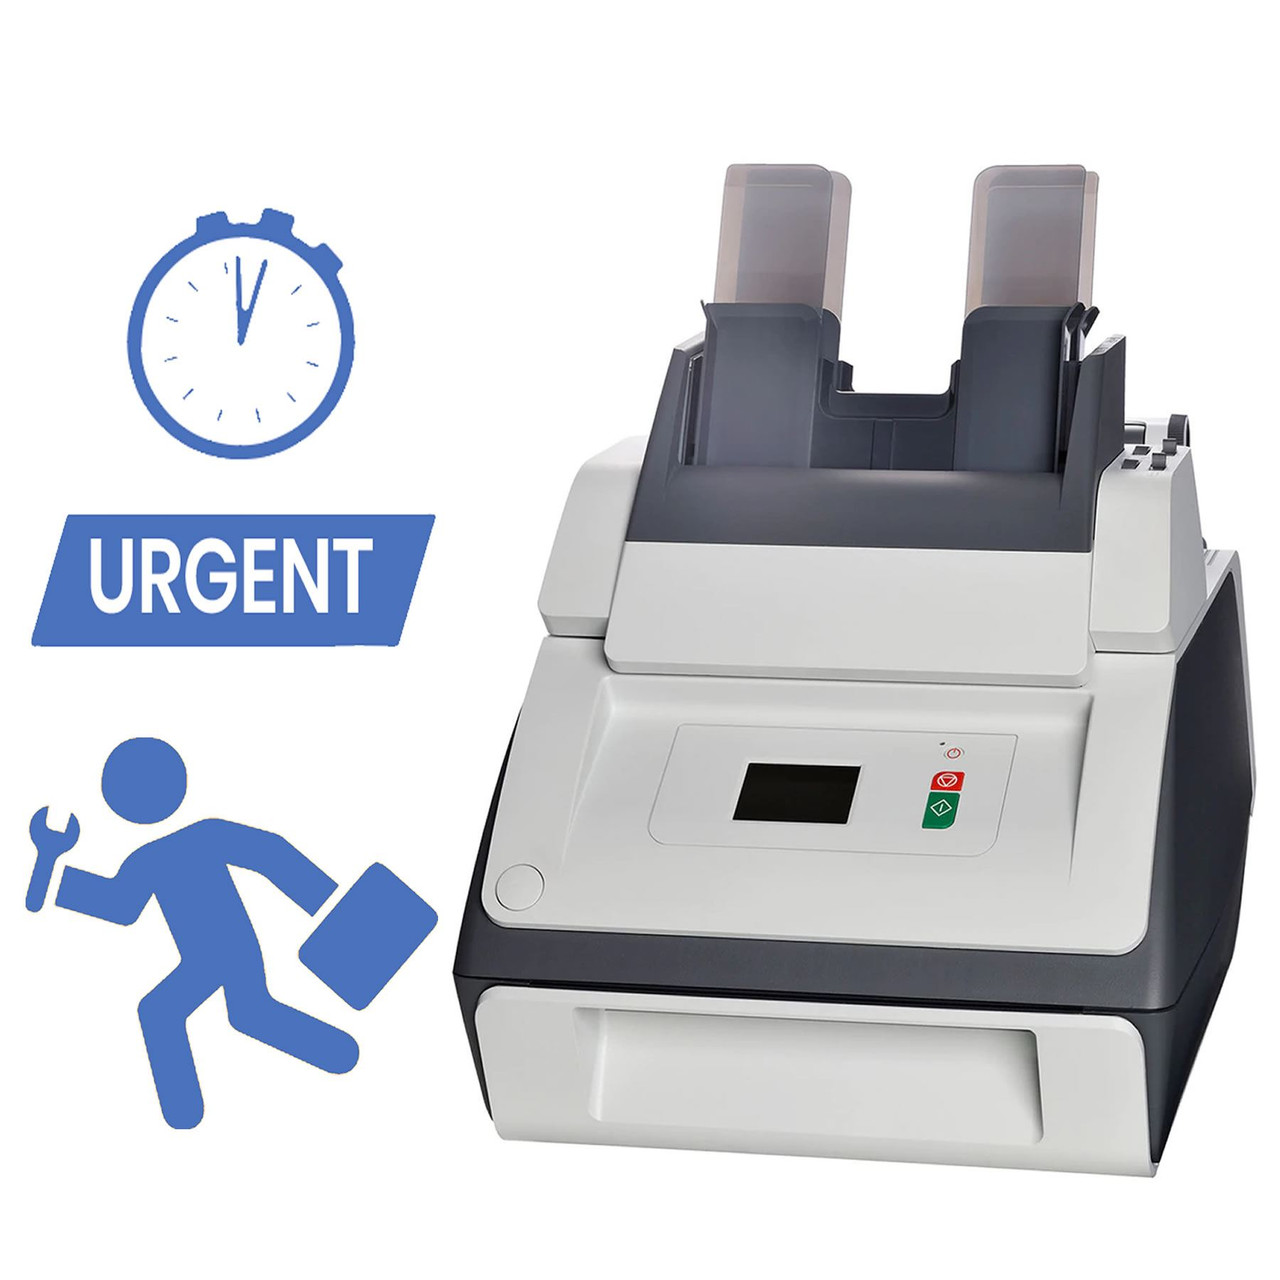 Mailroom / Finishing Equipment - URGENT Callout